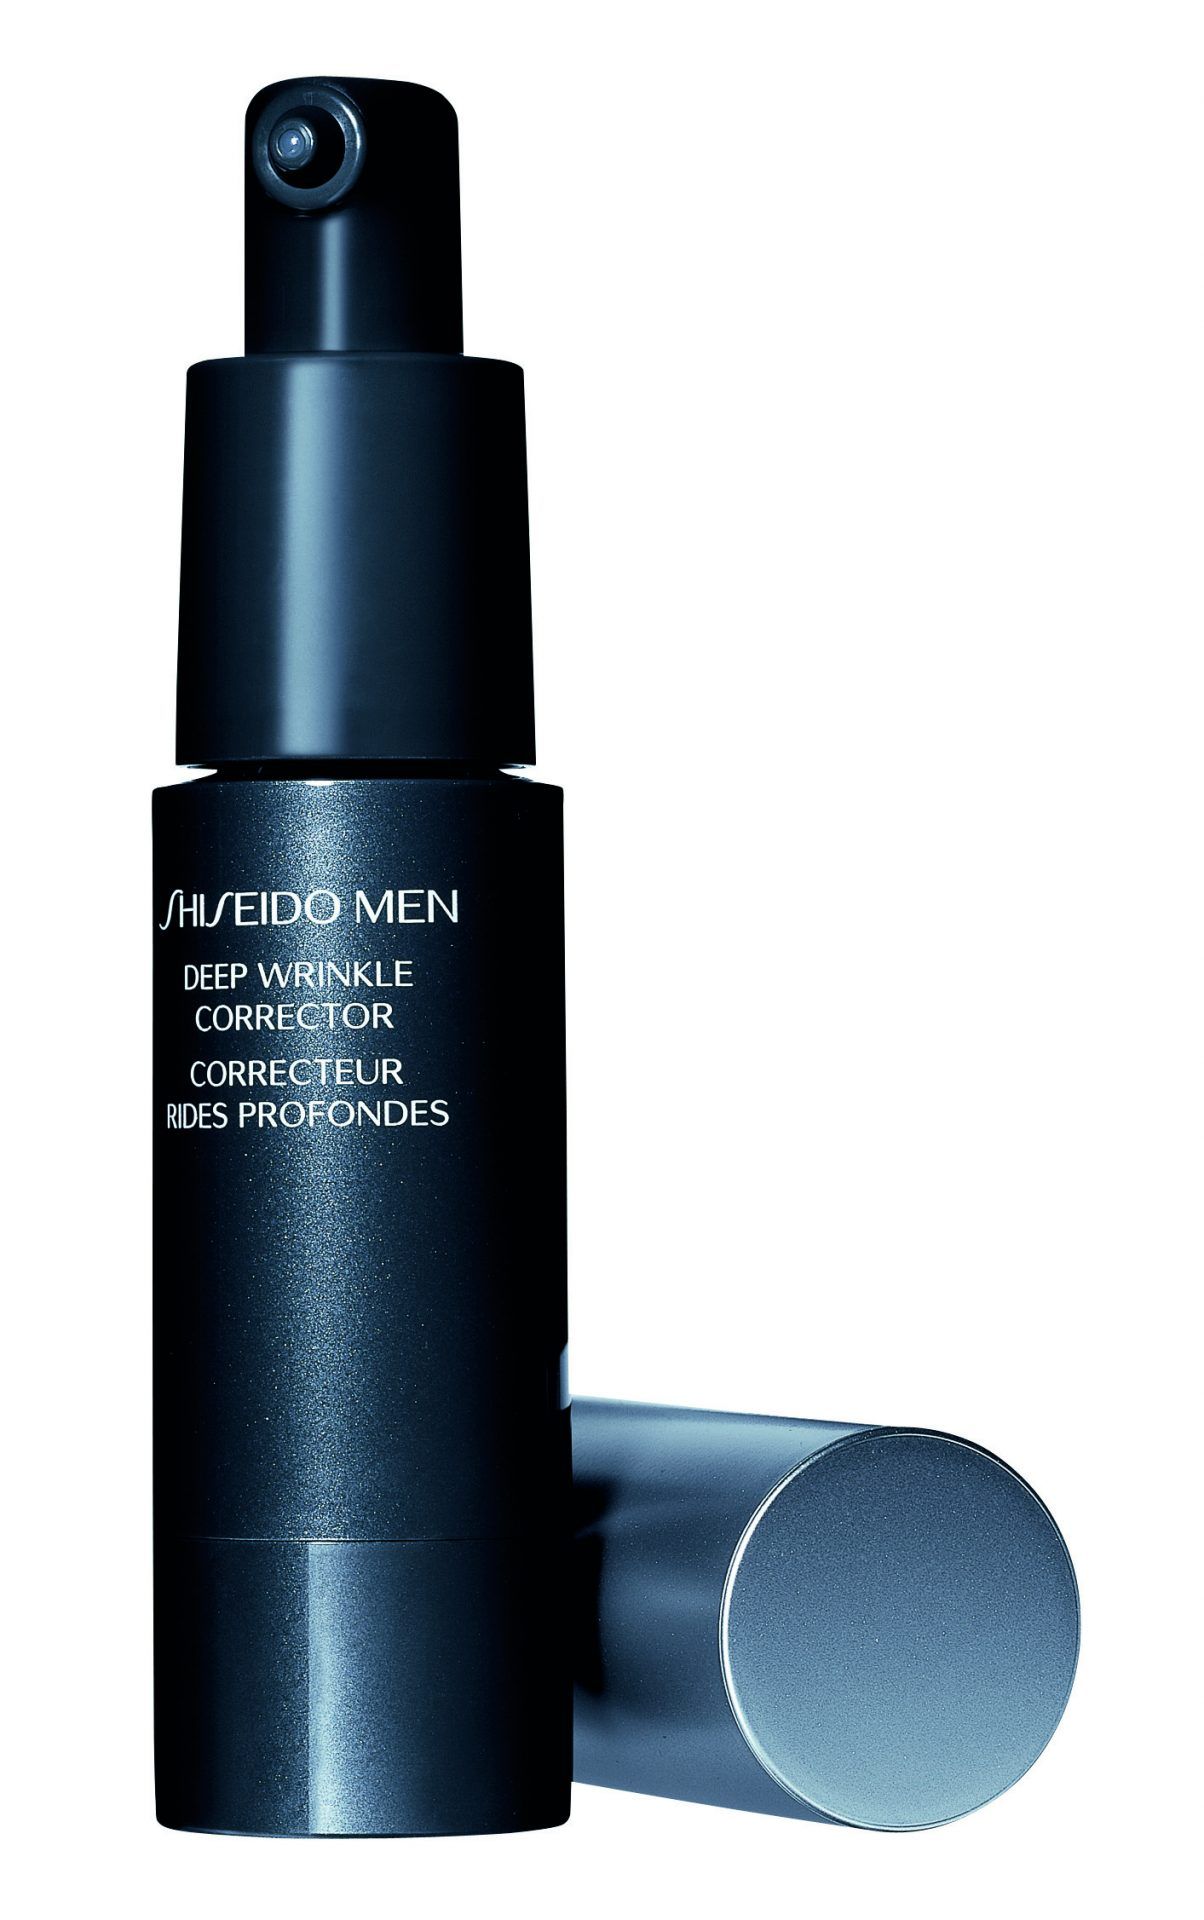 7. Shiseido MEN Deep Wrinkle Corrector